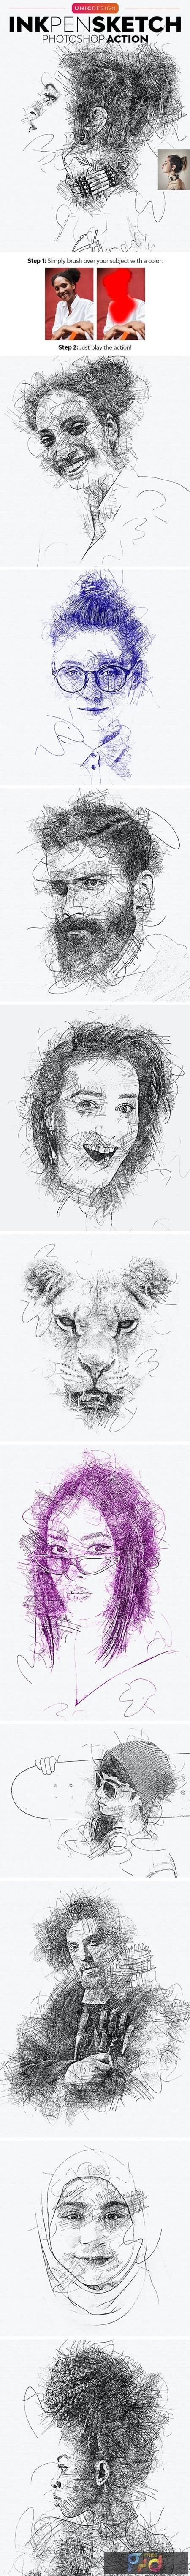 Ink Pen Sketch Photoshop Action 25914944 1